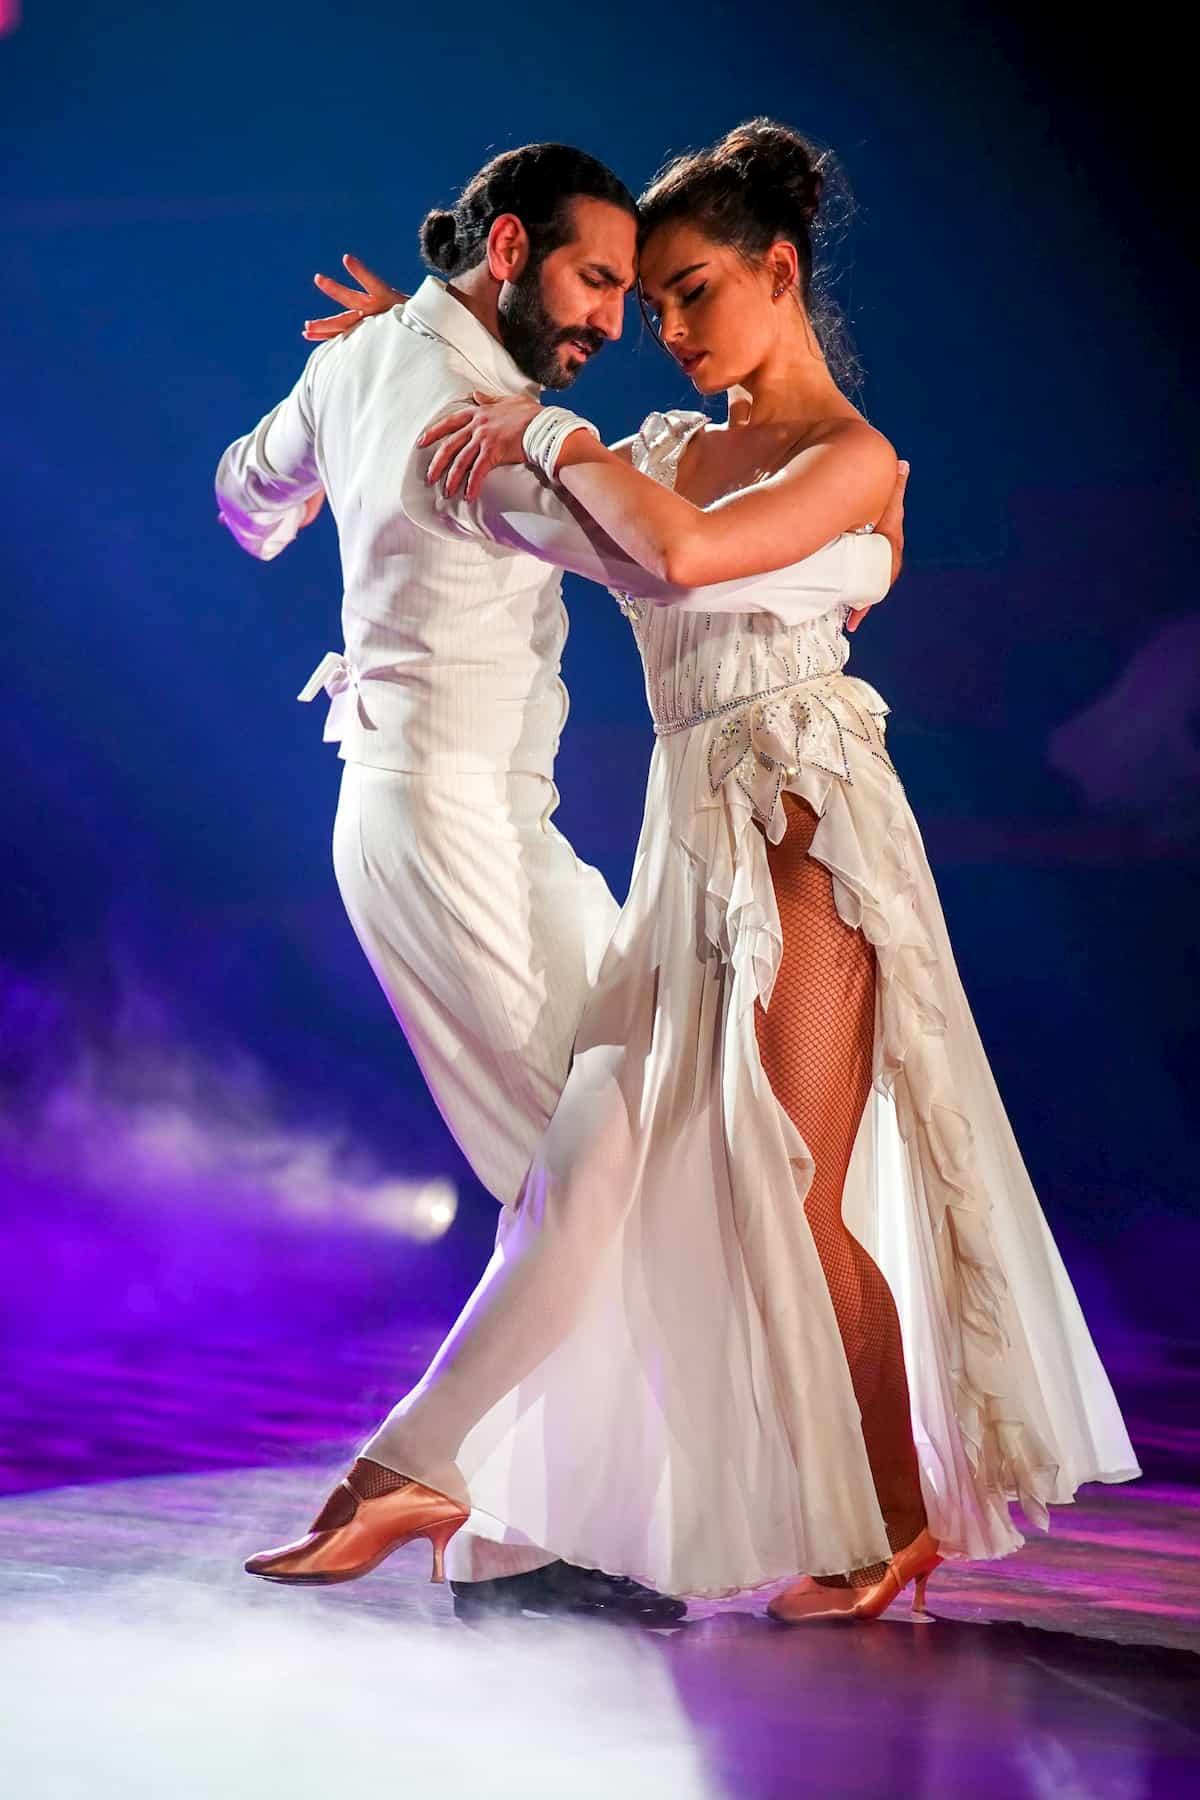 Massimo Sinato und Lili Paul-Roncalli bei Let's dance am 27.3.2020